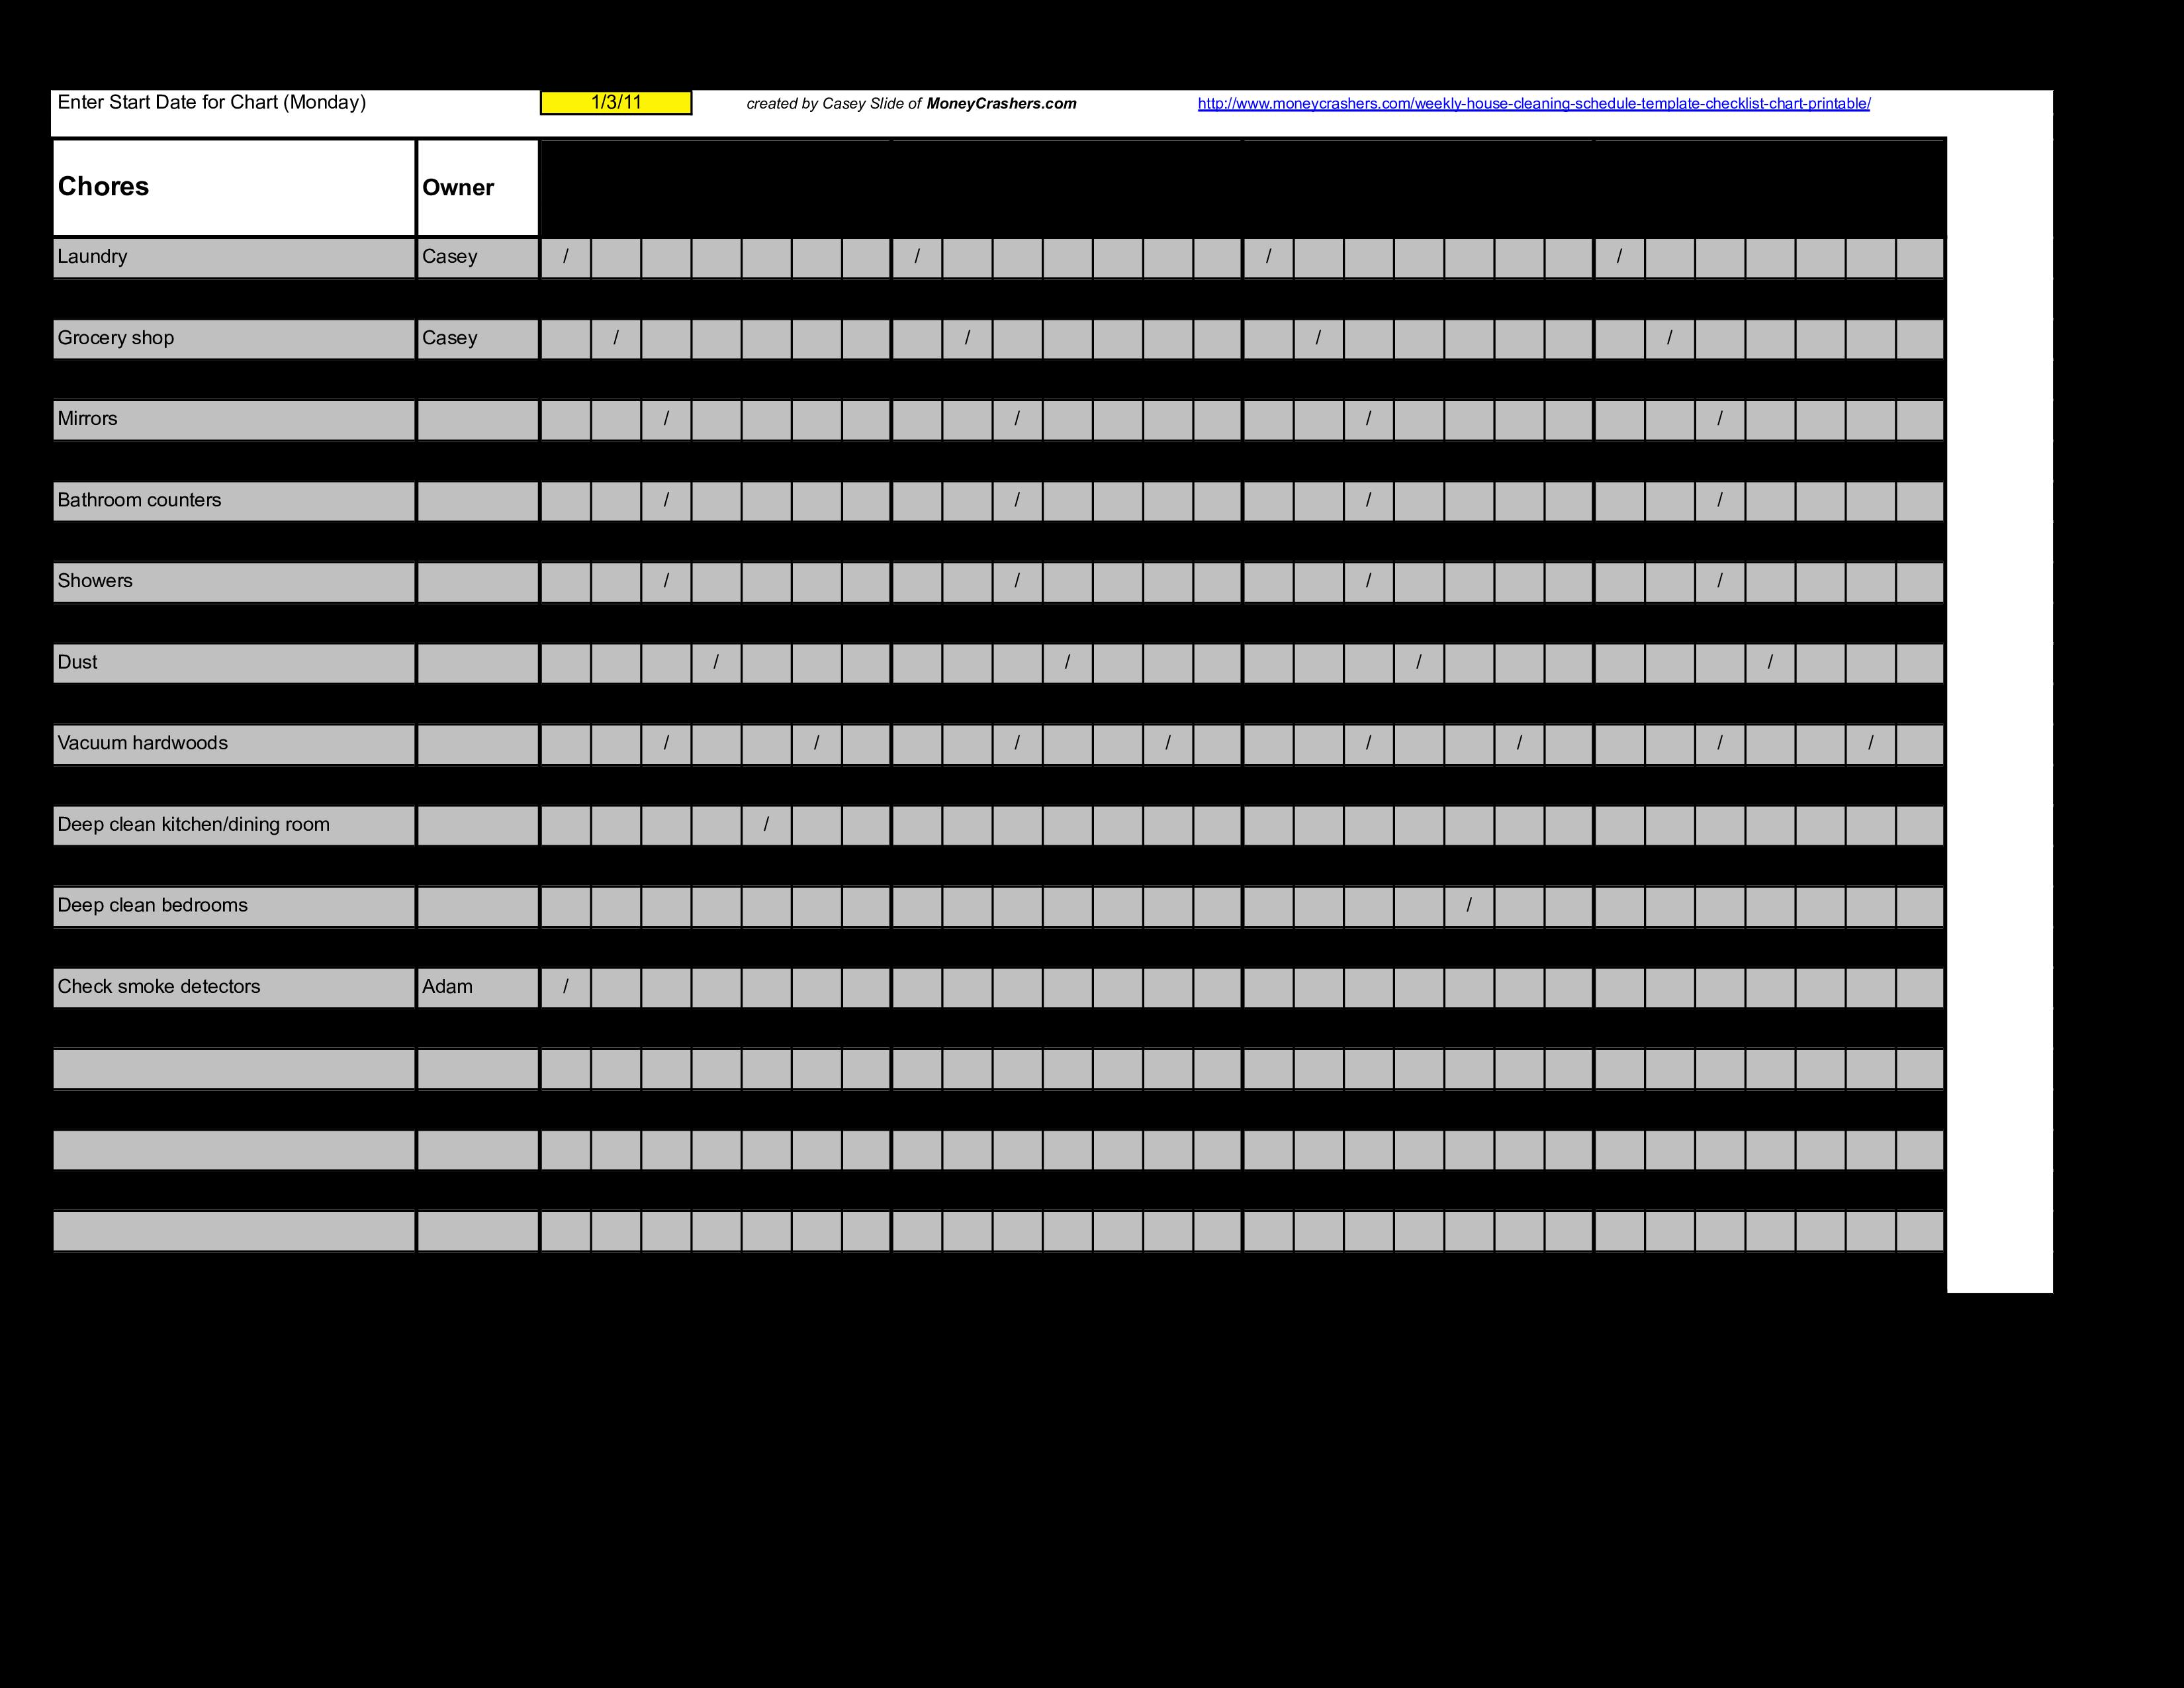 Restaurant Cleaning Schedule Format Templates At Allbusinesstemplates Com